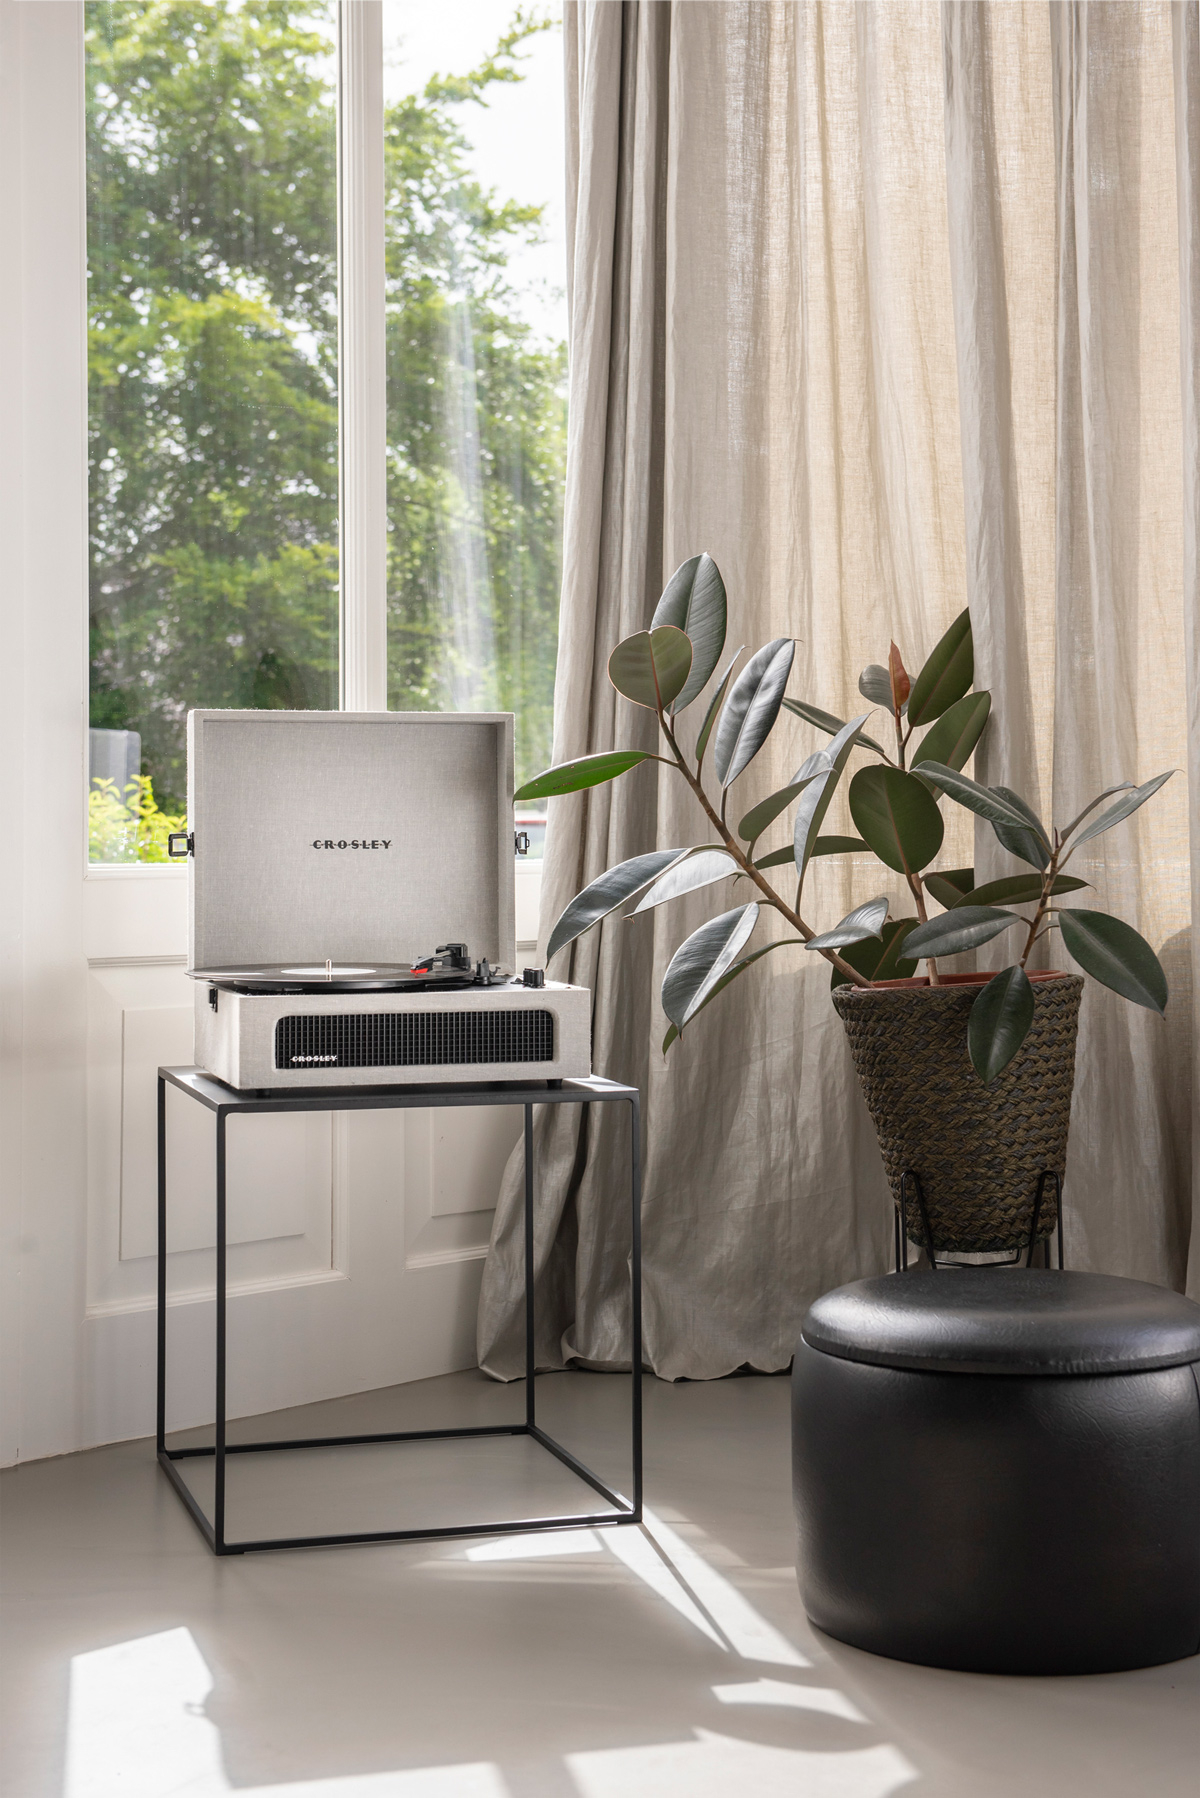 Compacte koffermodel platenspeler in een frisse, witte kleur.